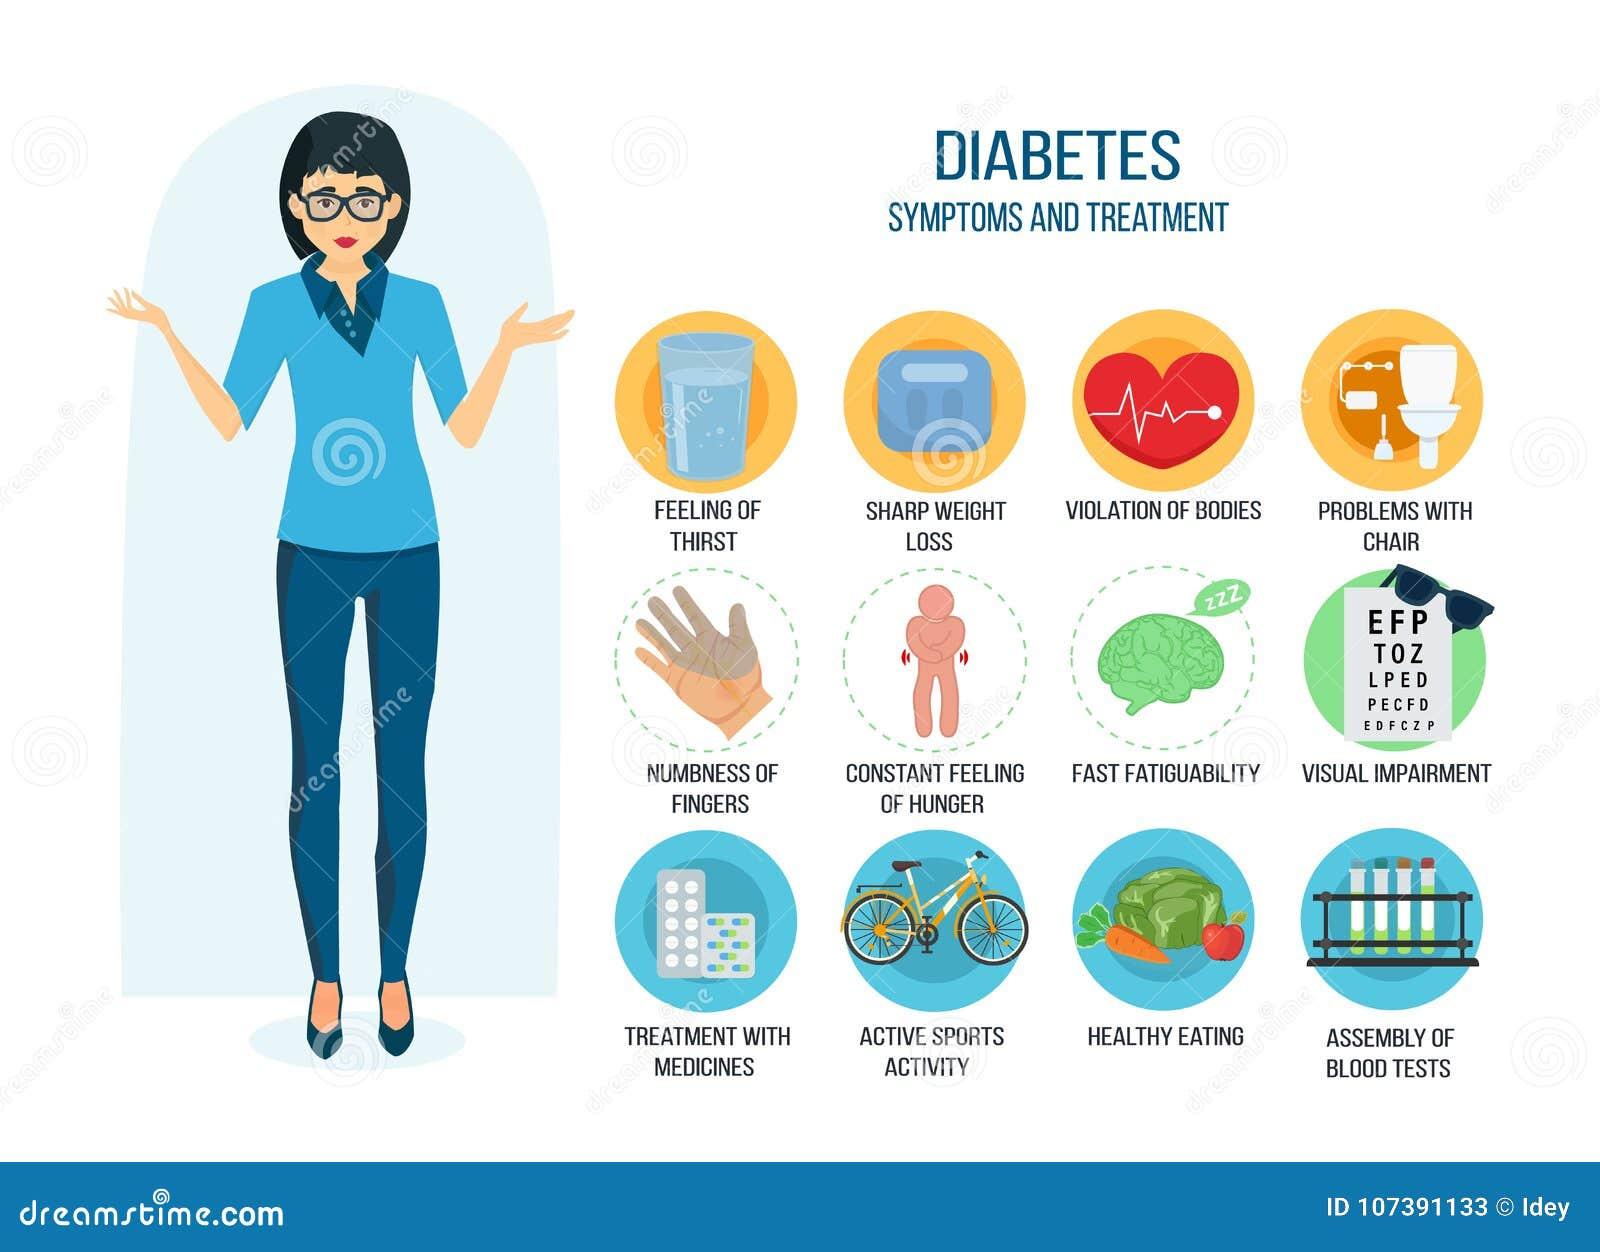 Diabetes Prevention and Risk forecast